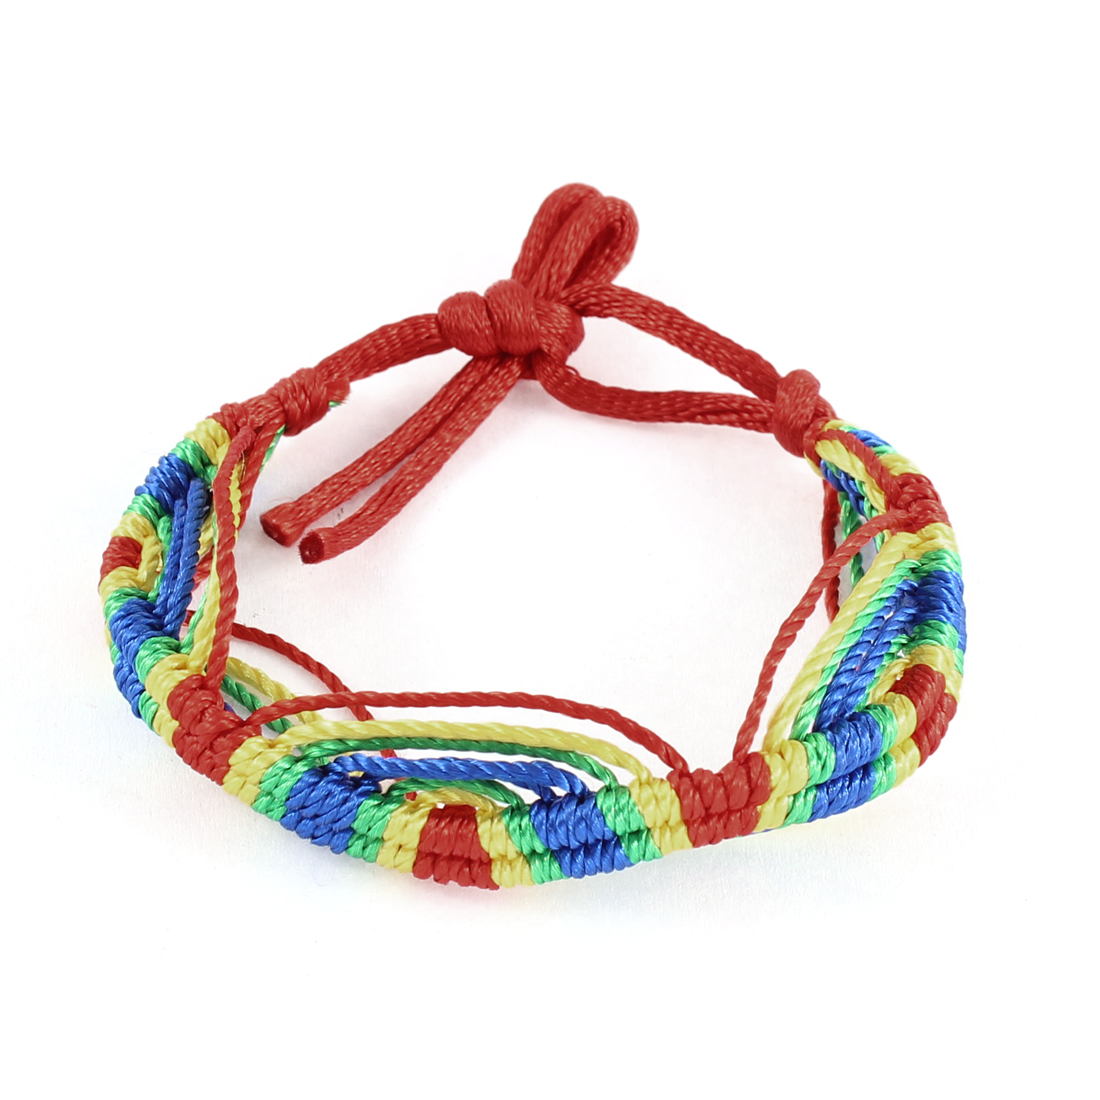 Lady Red Braid String Handmade Woven Wrist Bracelet